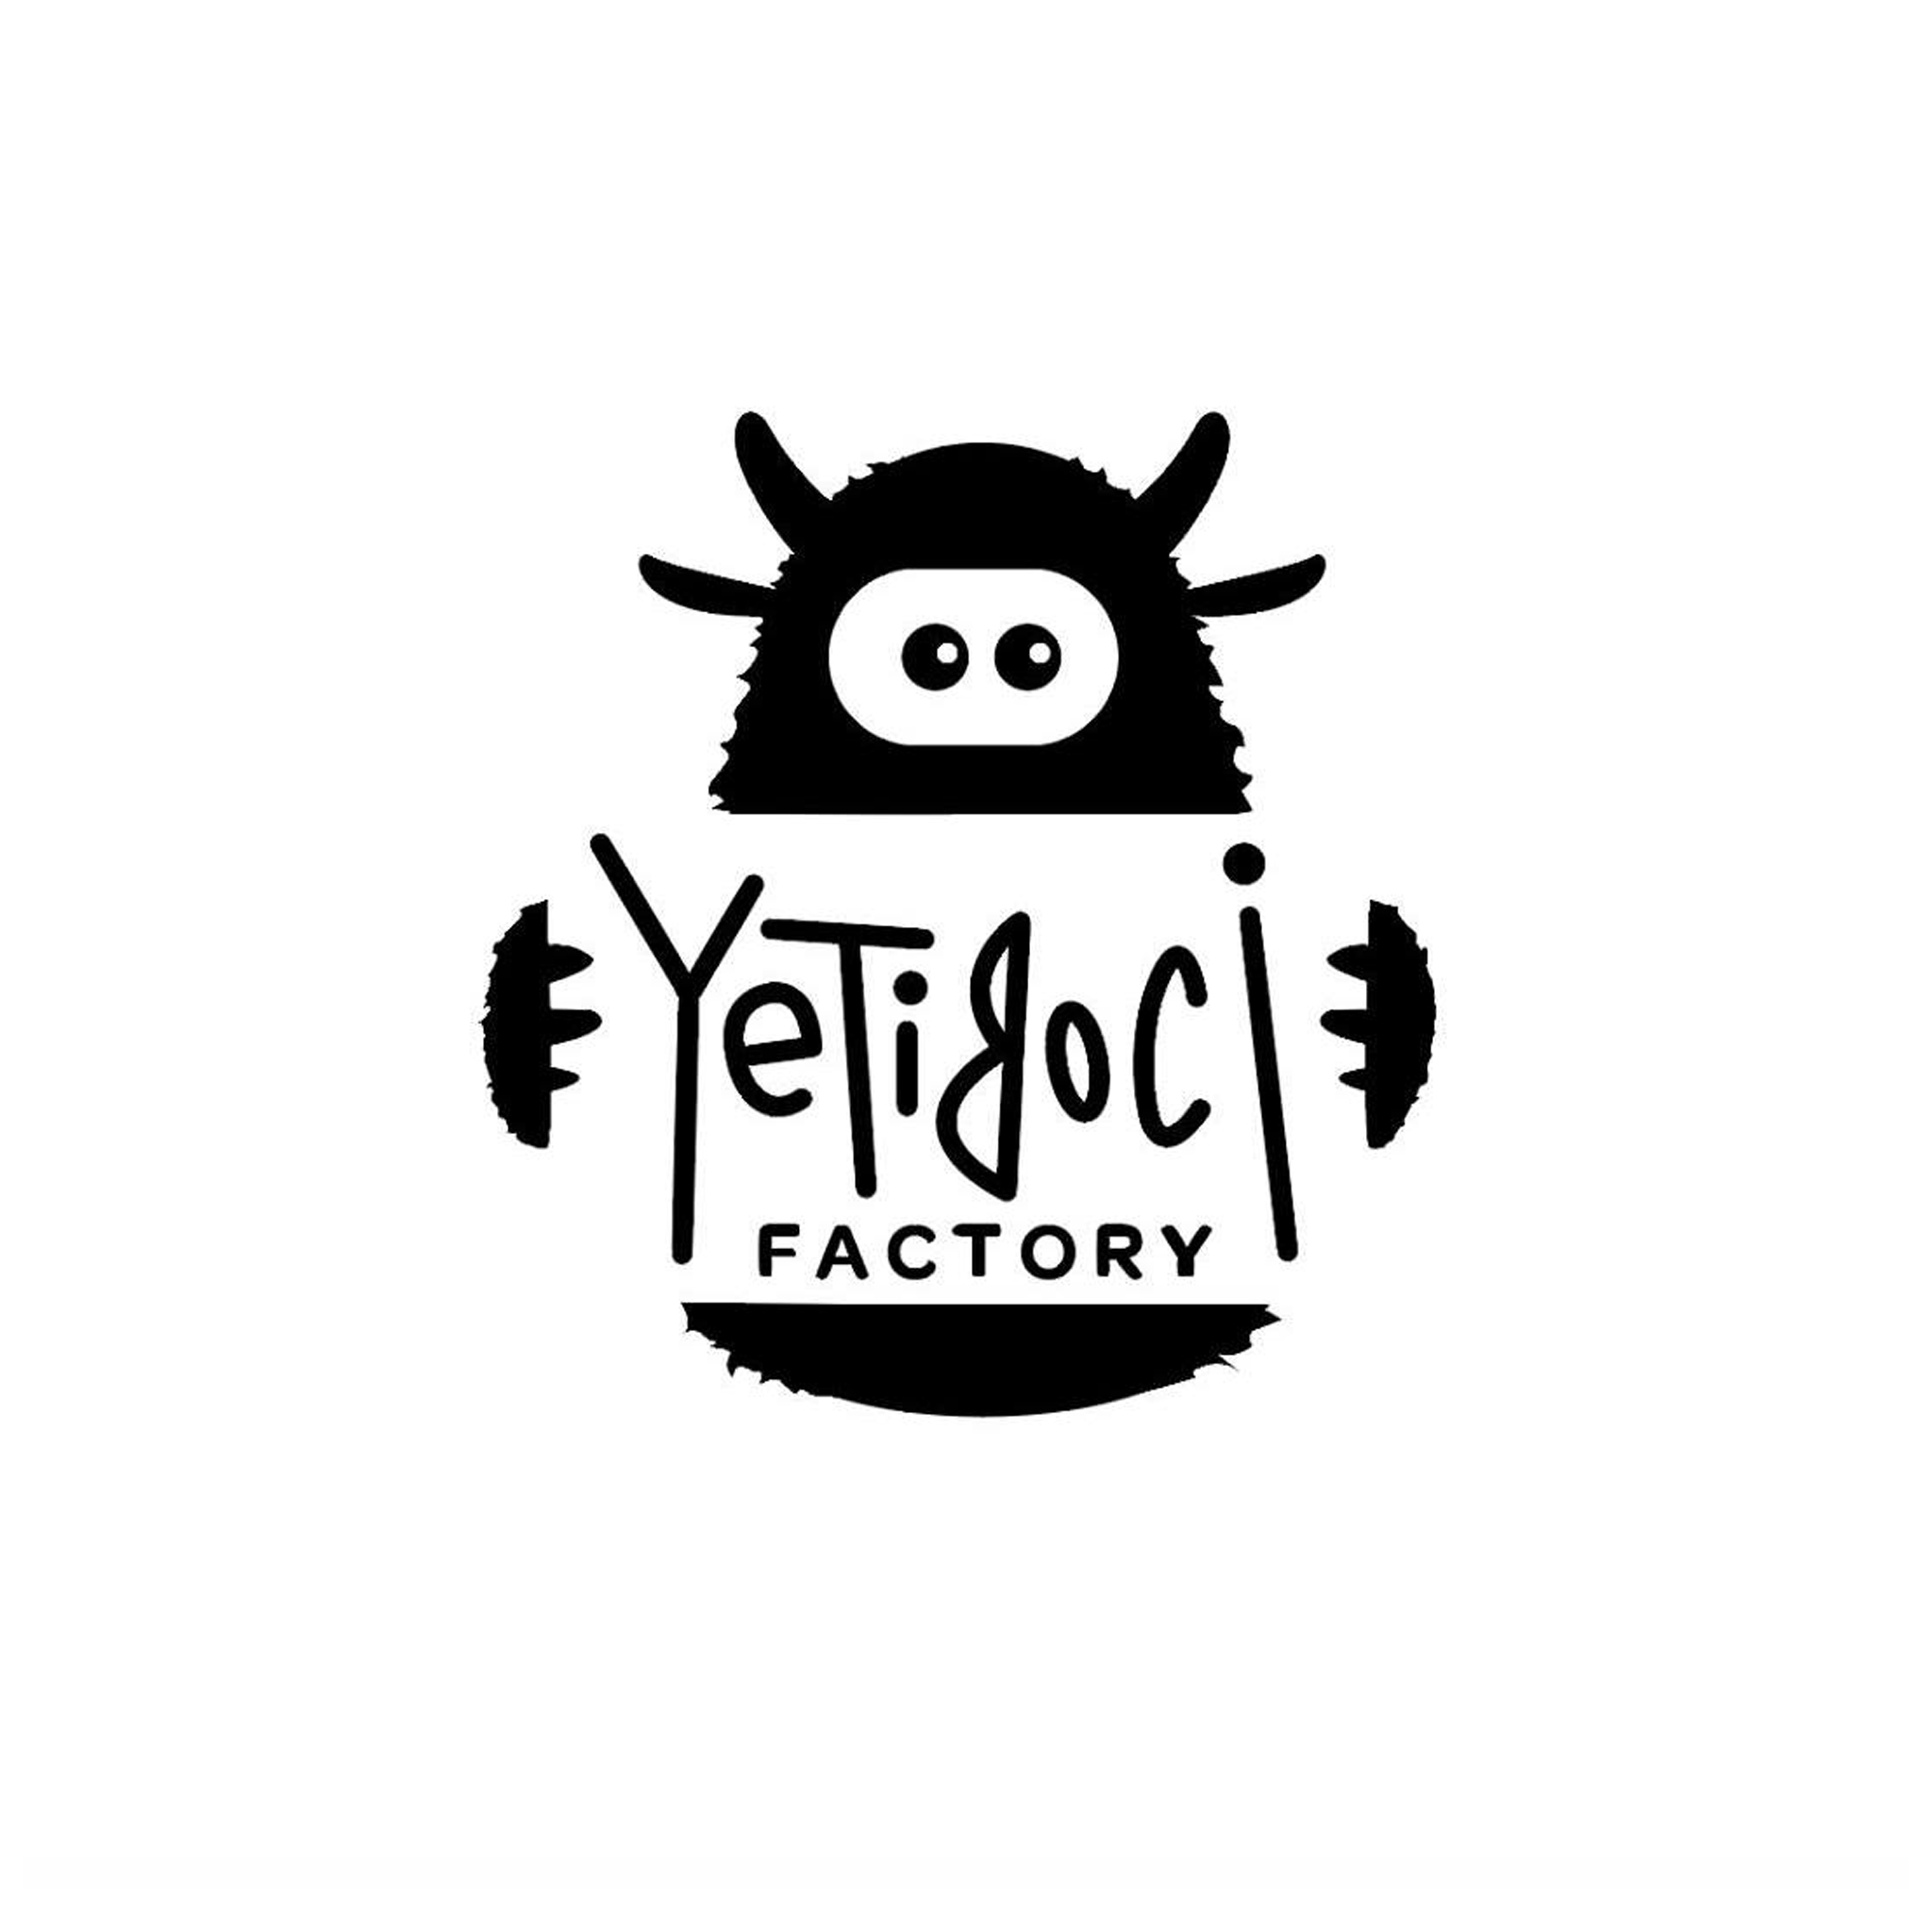 Yetiboci Factory